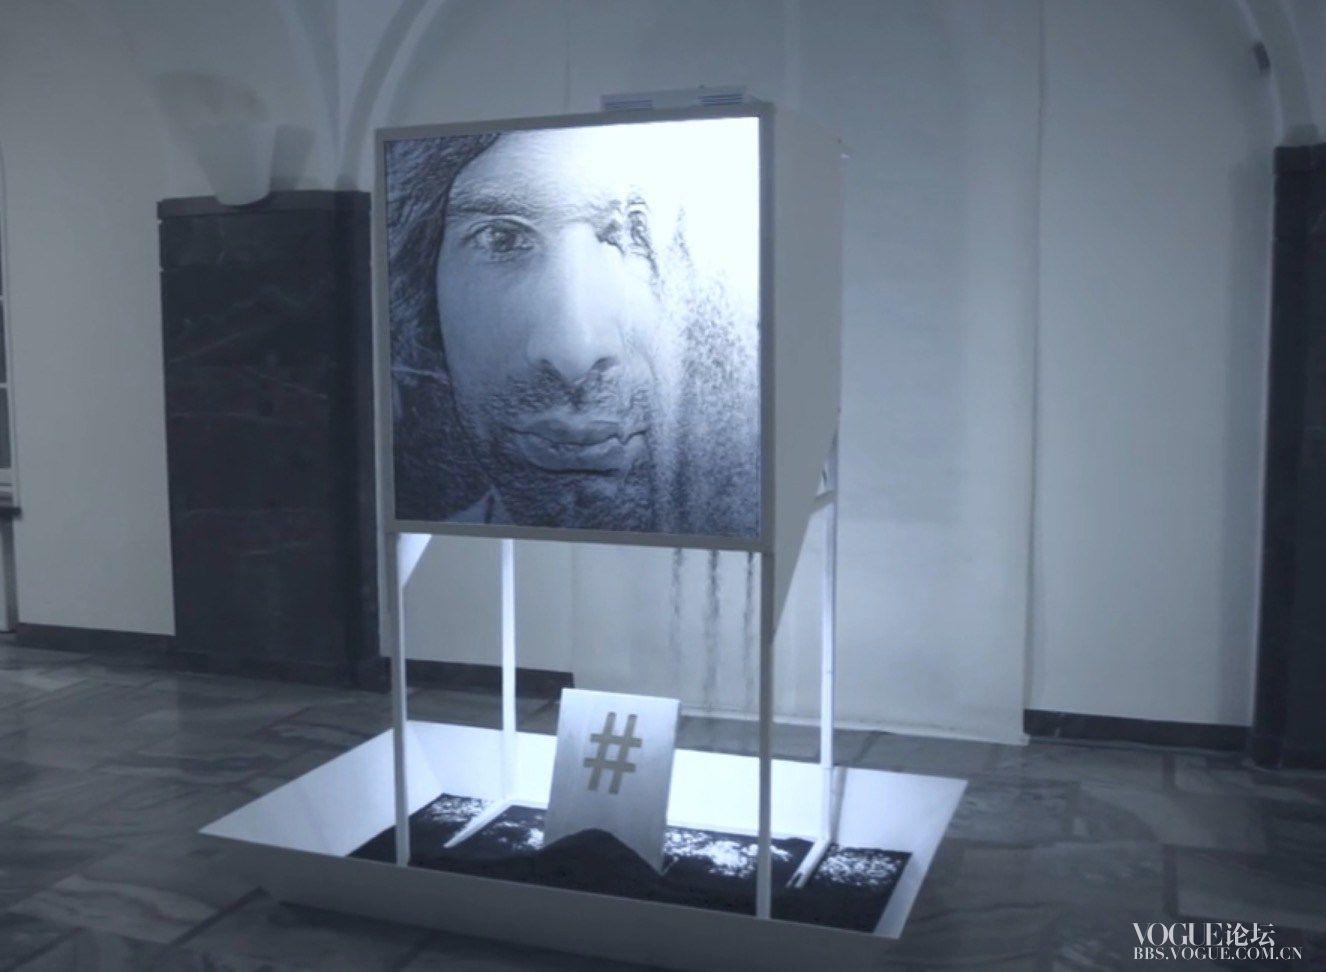 hash-2-ash-selfie-digital-installation-3.jpg